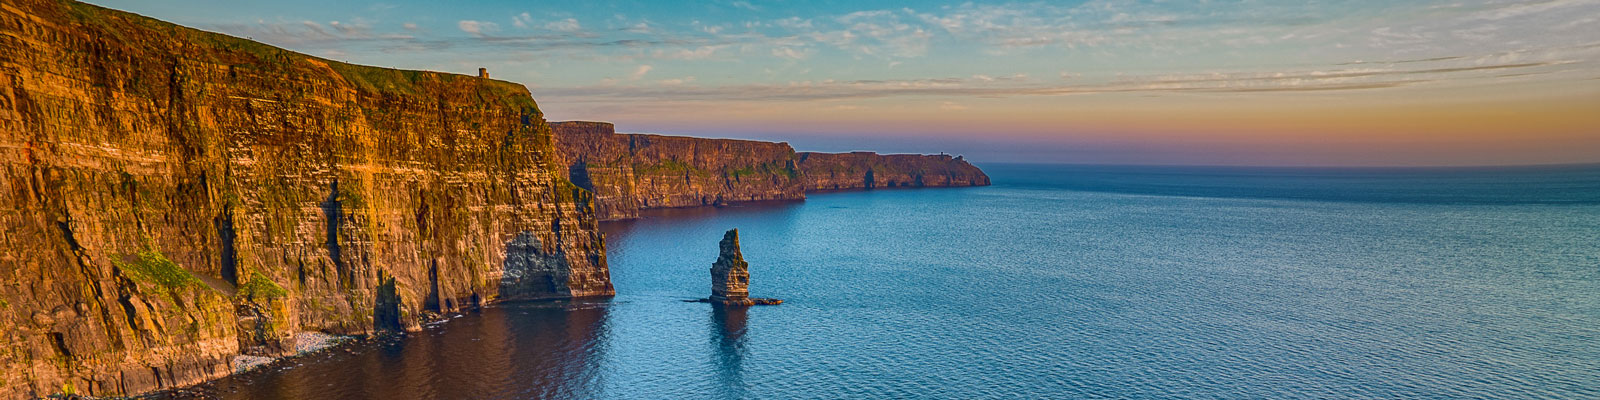 Ireland Vegan Travel Guide